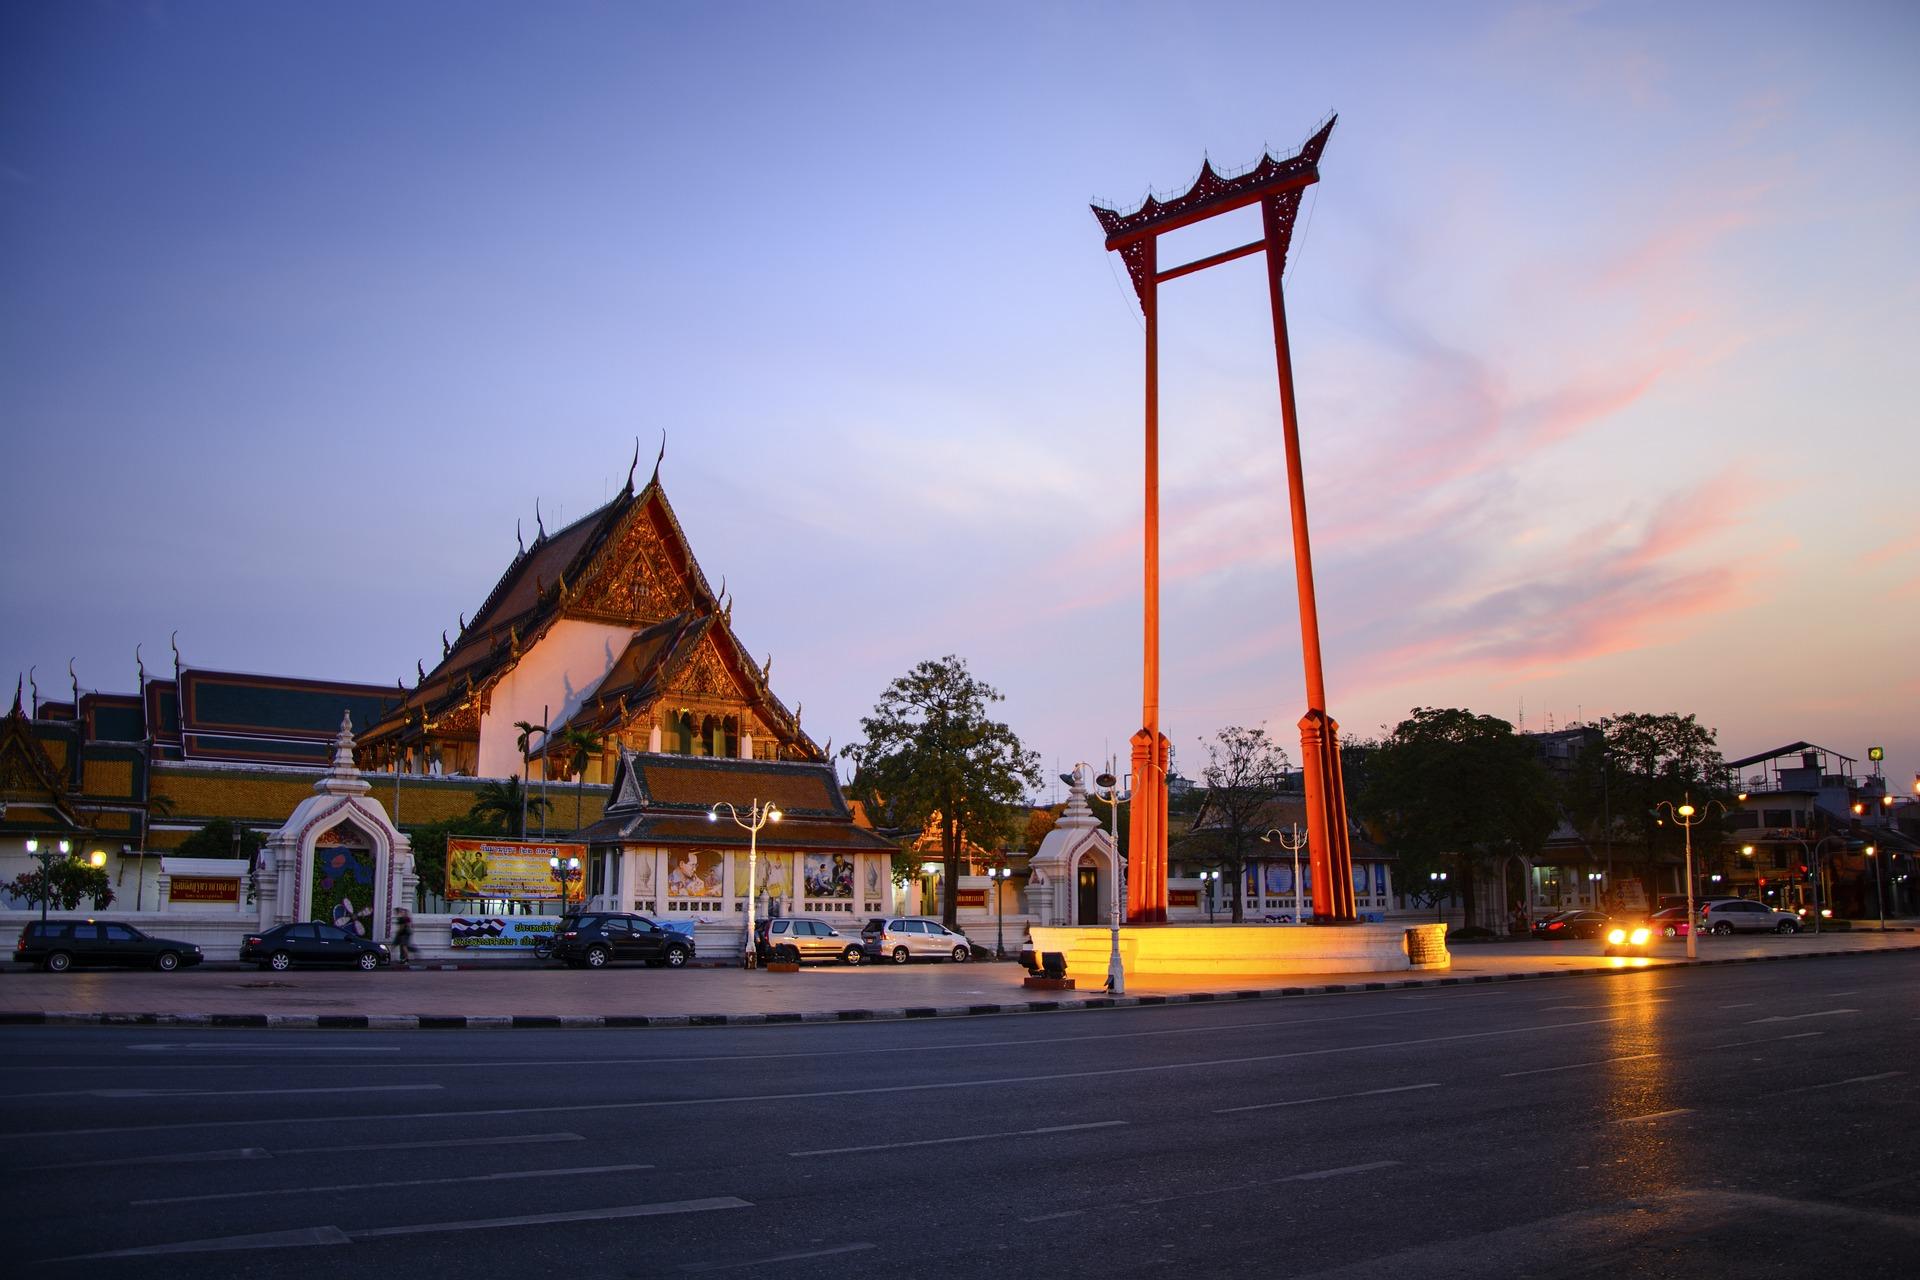 Giant Swing, Bangkok, Thailand